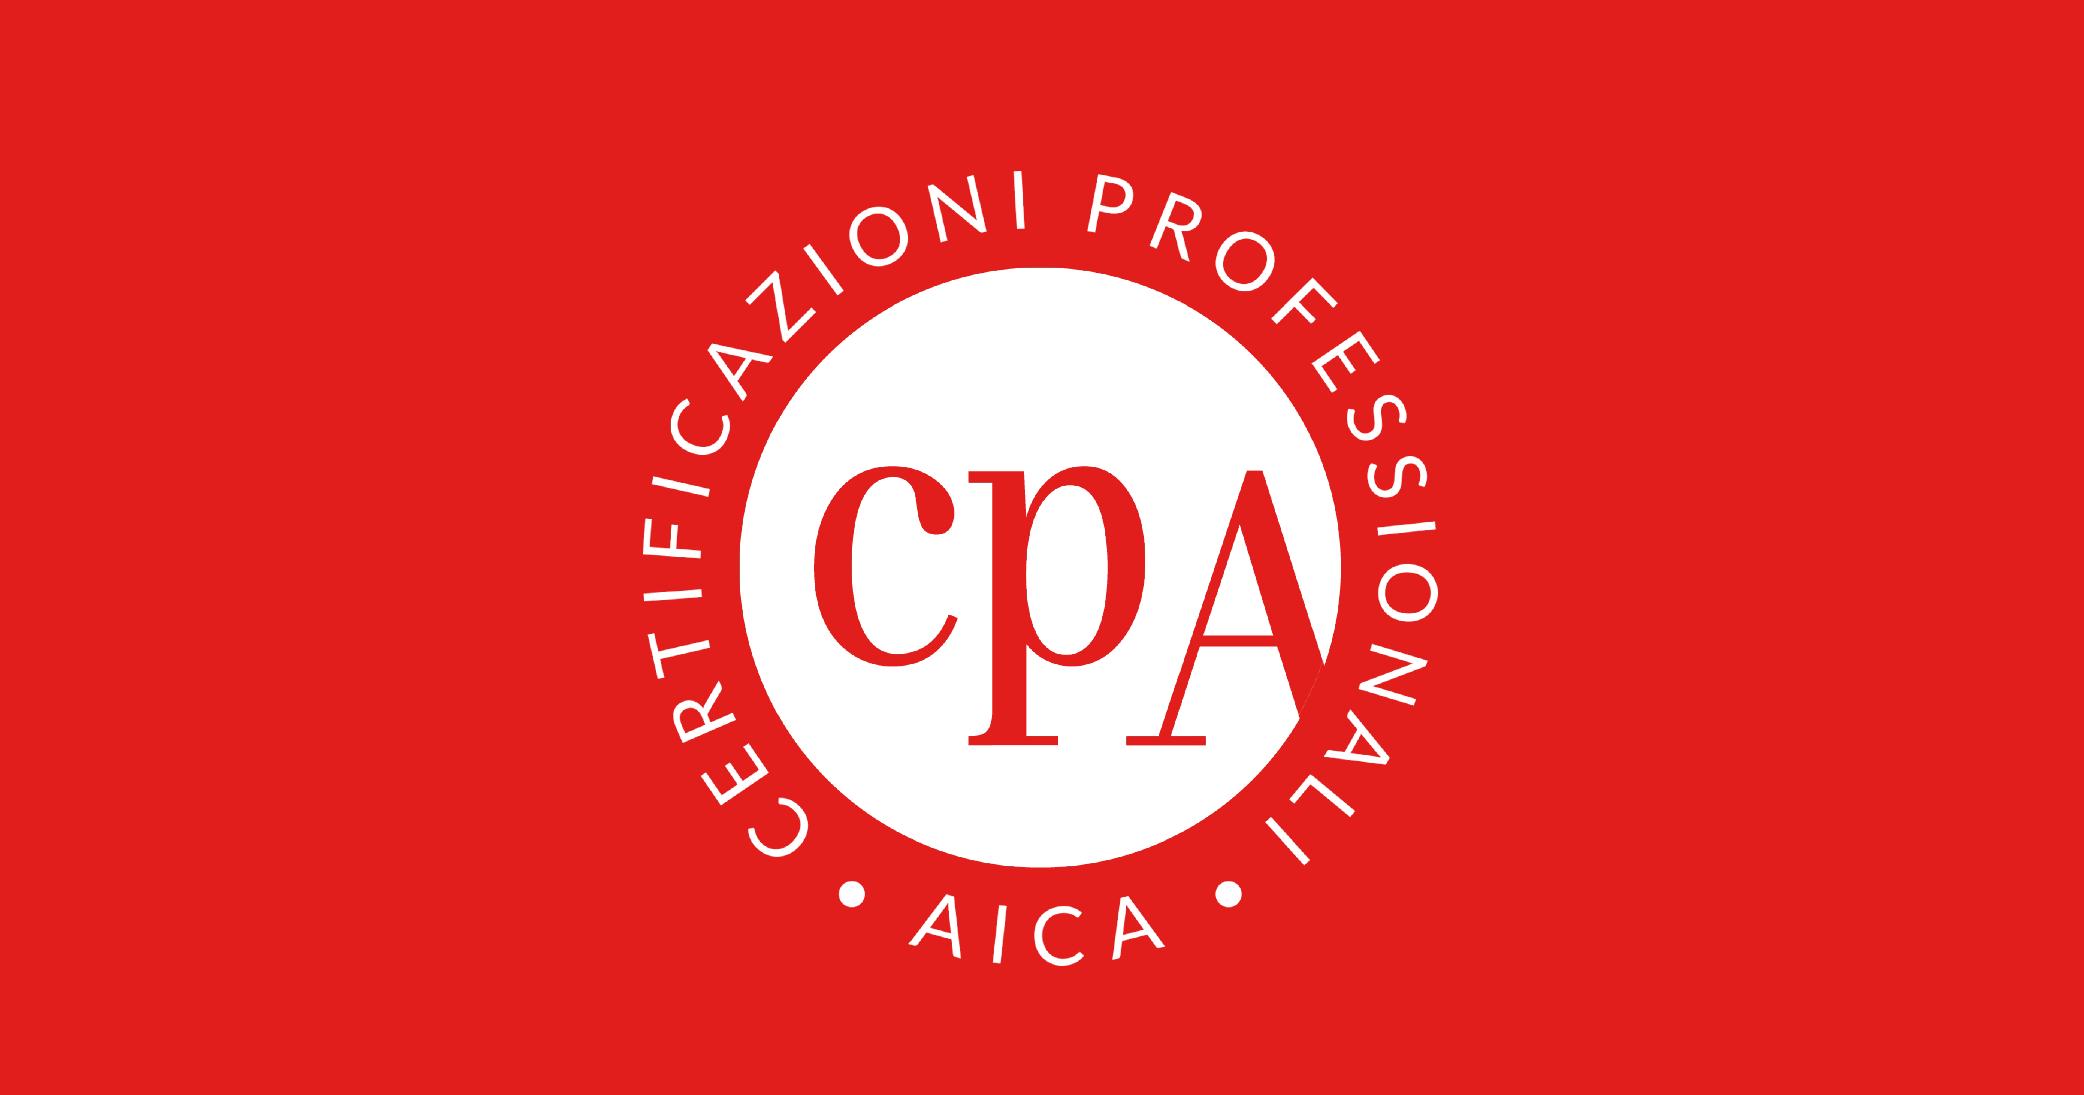 sfondo rosso - logo CPA